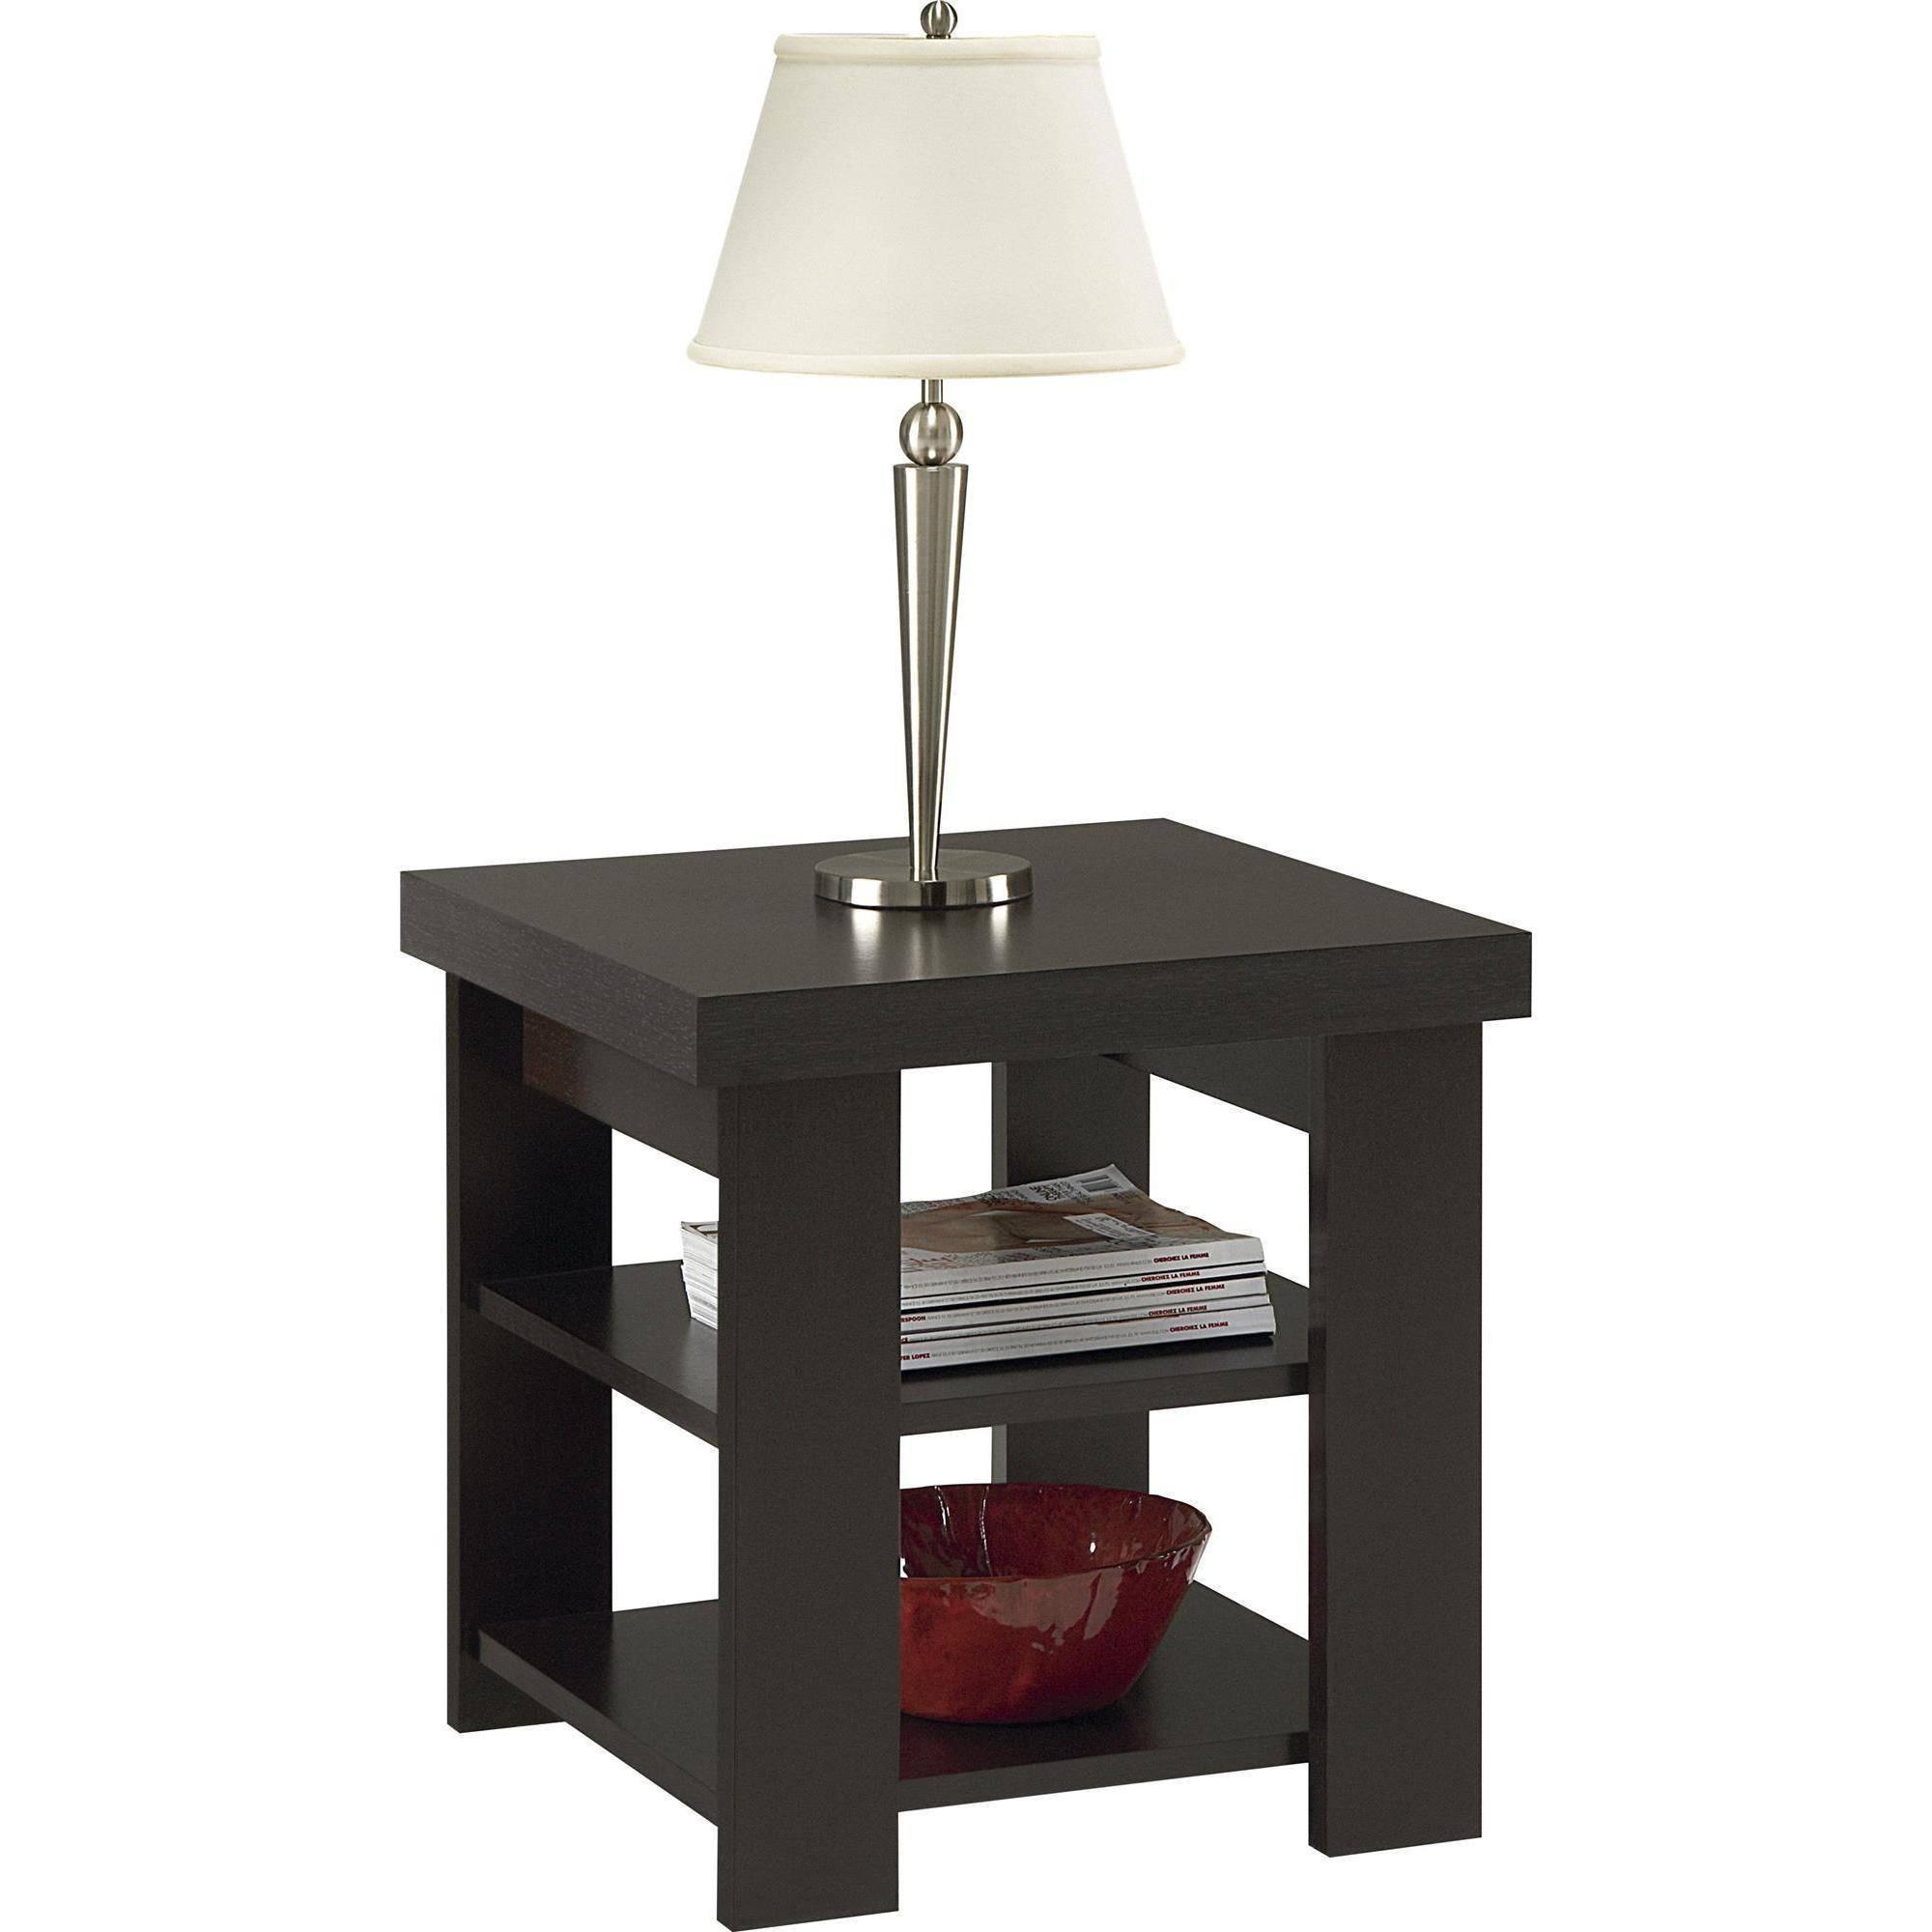 Lovely Larkin Coffee Table, Sofa Table U0026 End Table Value Bundle, Espresso    Walmart.com